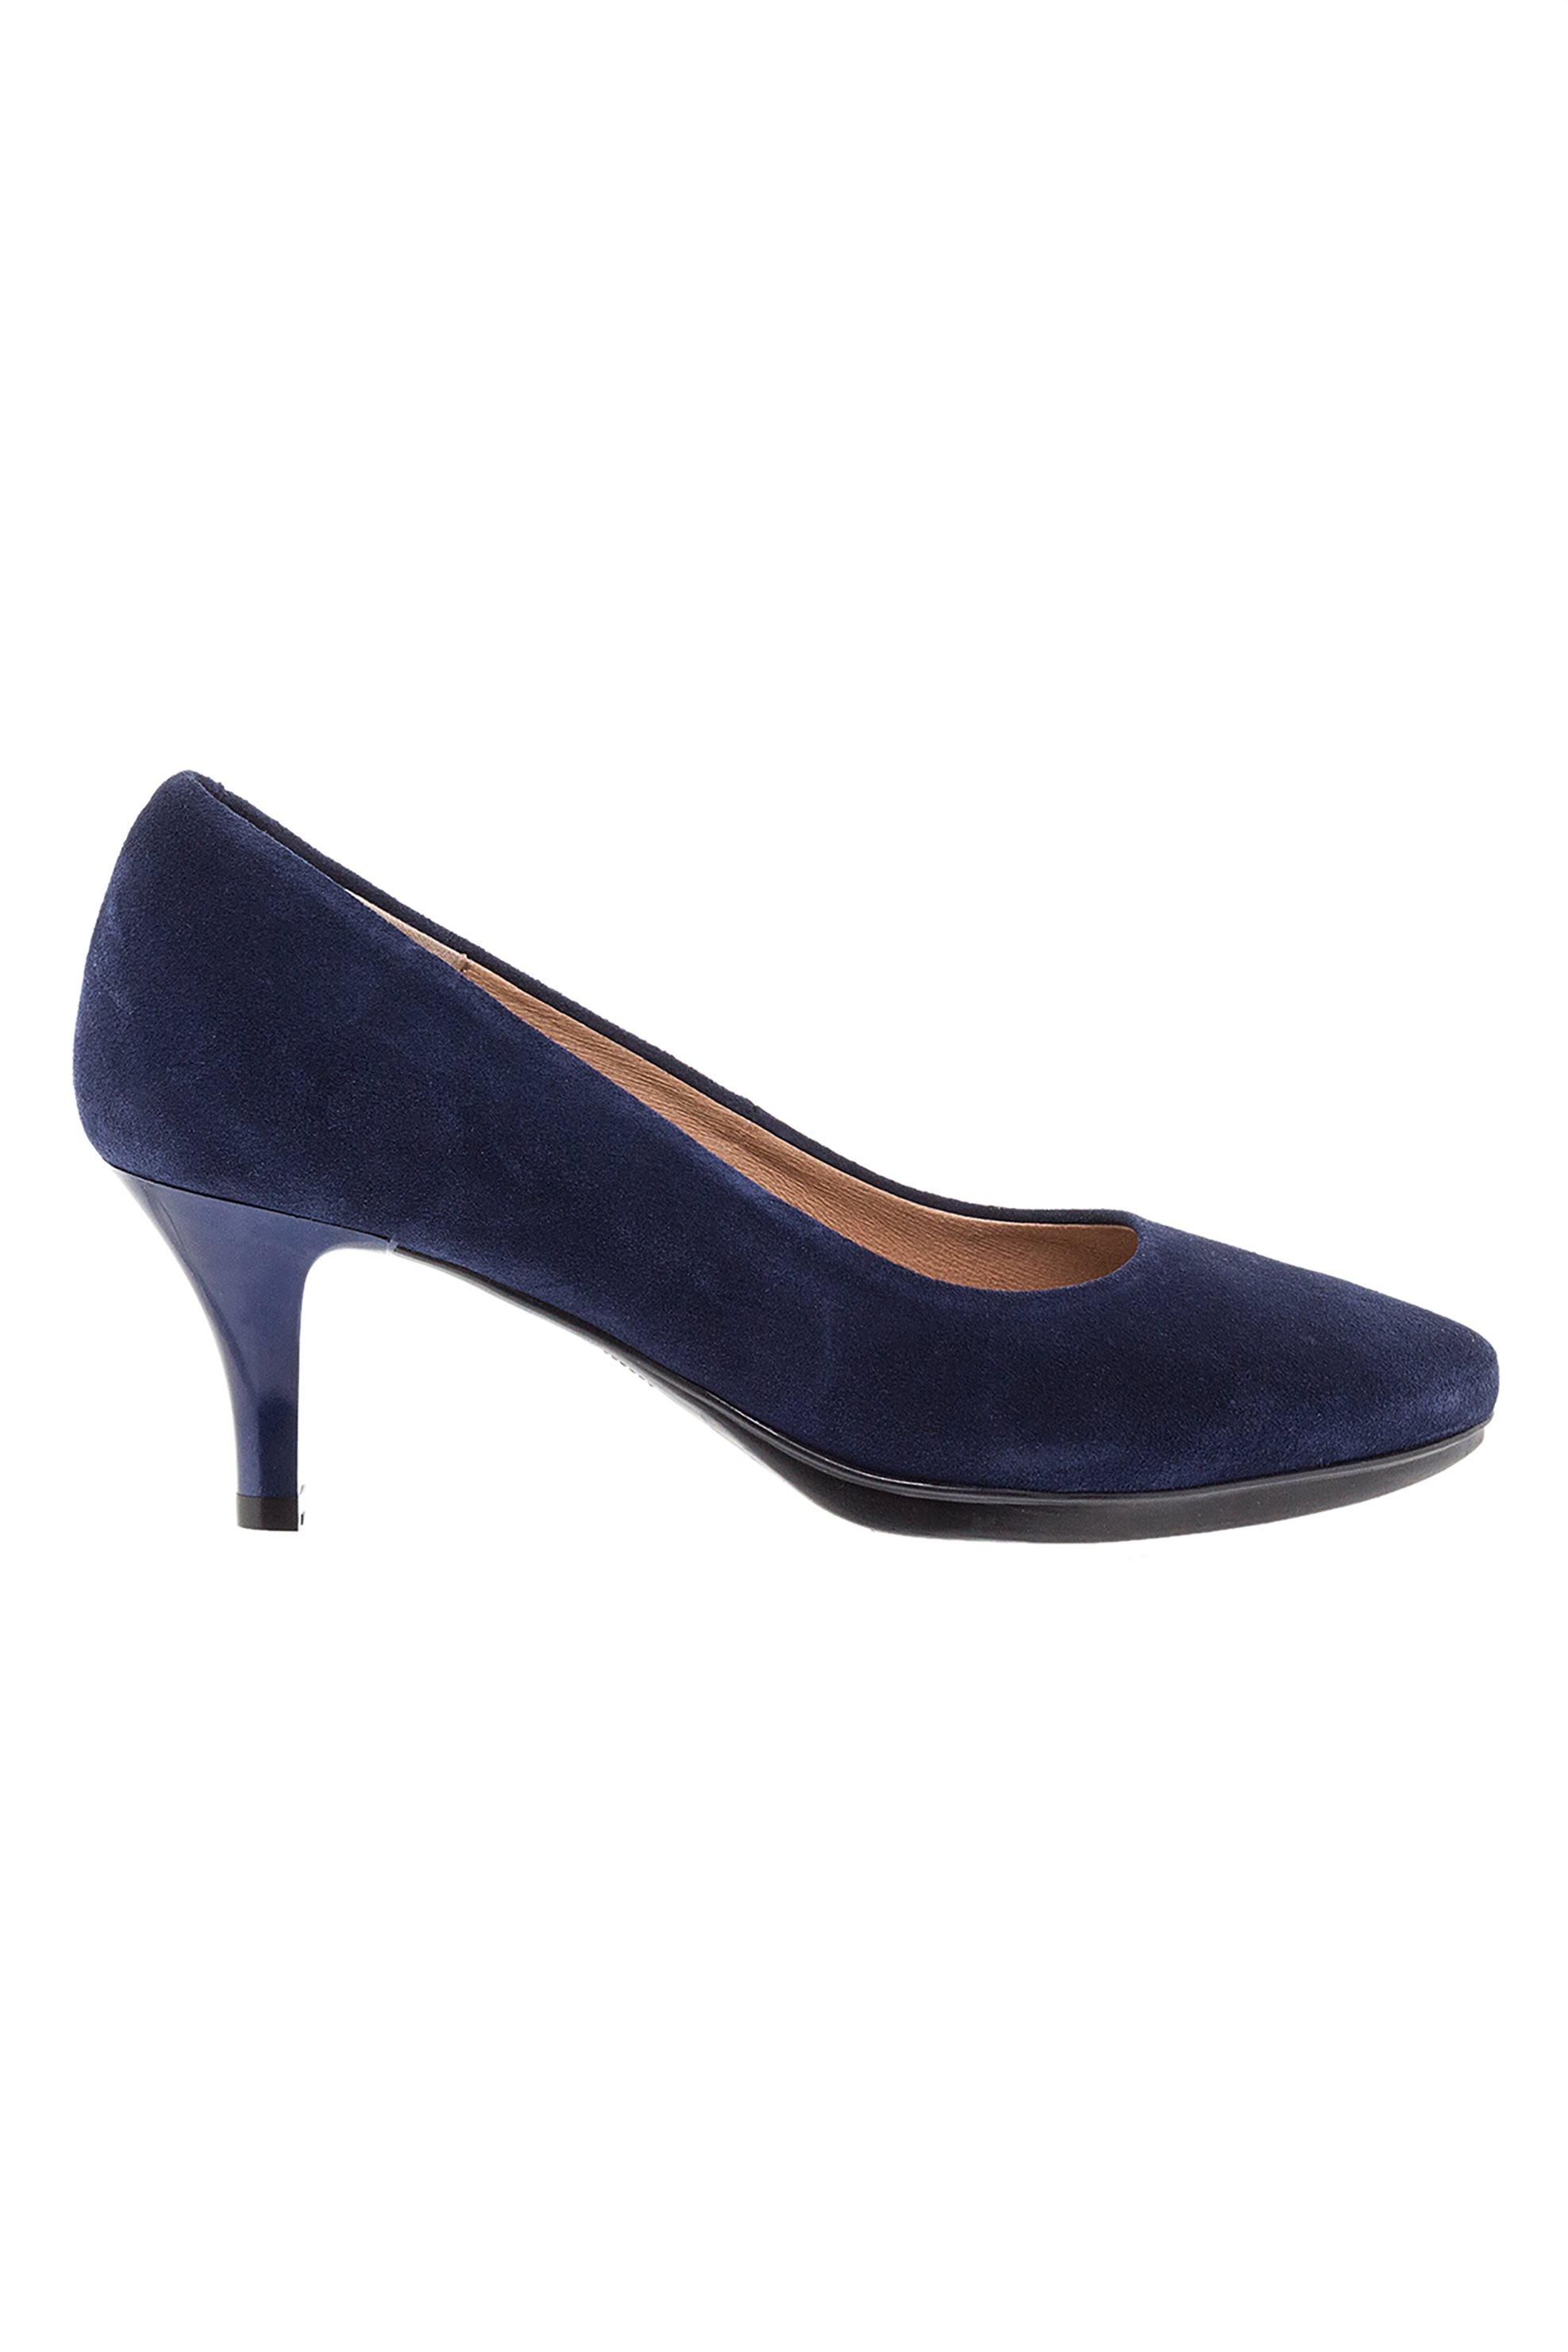 Avvento γυναικεία suede γόβα - DΕS-91060 Κ19 - Μπλε Σκούρο